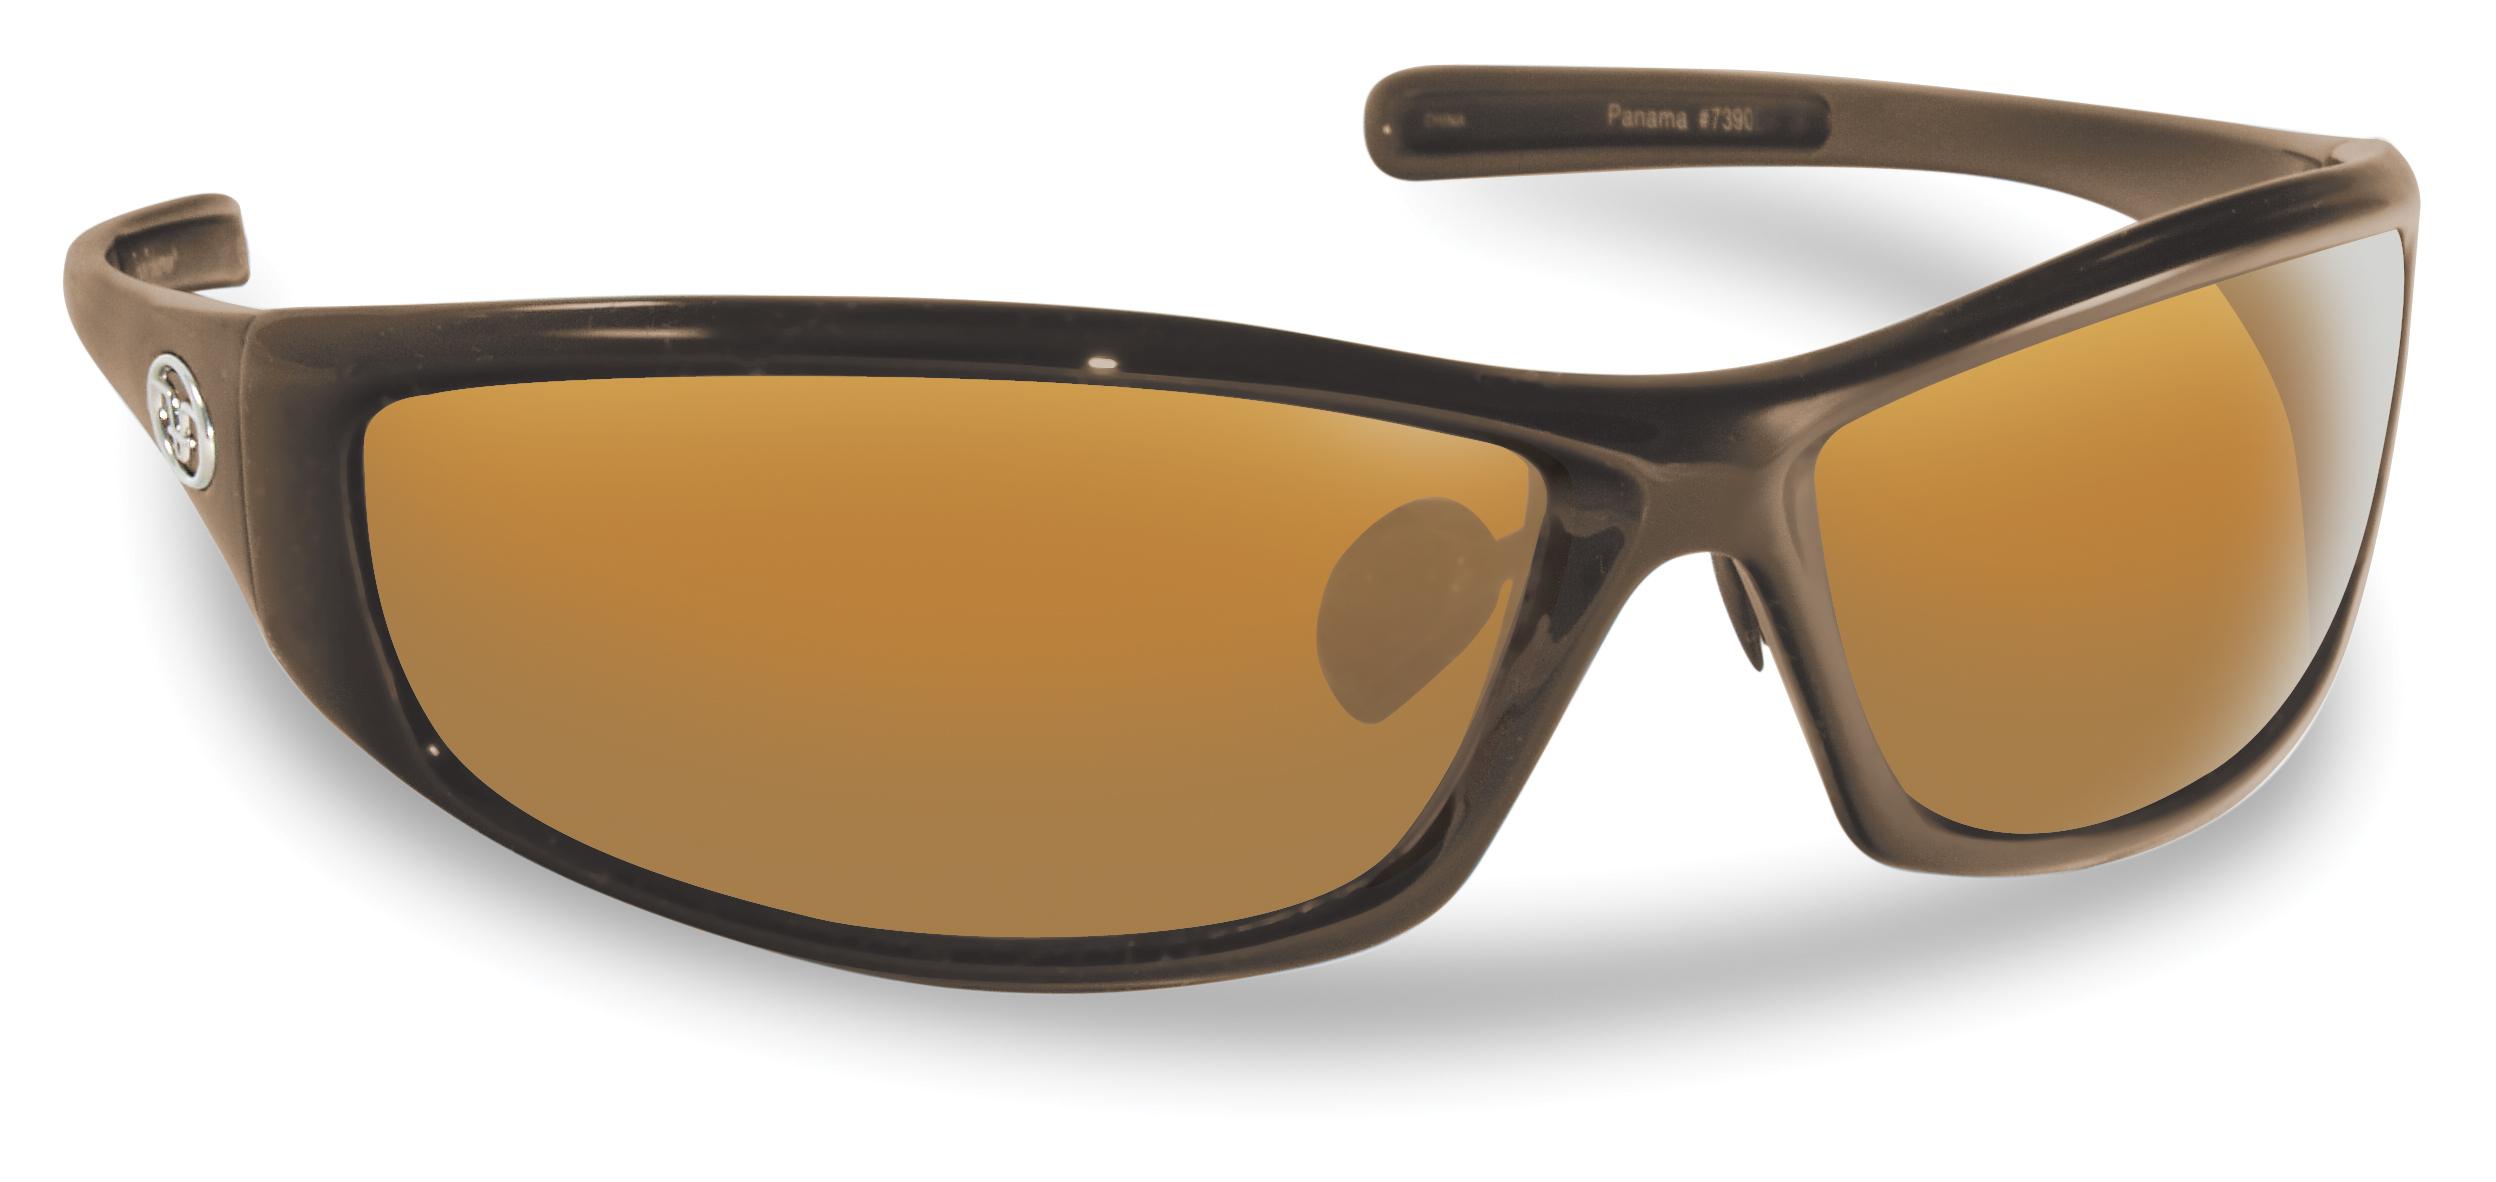 19270003524 Flying Fisherman Panama Sunglasses – Glasgow Angling Centre